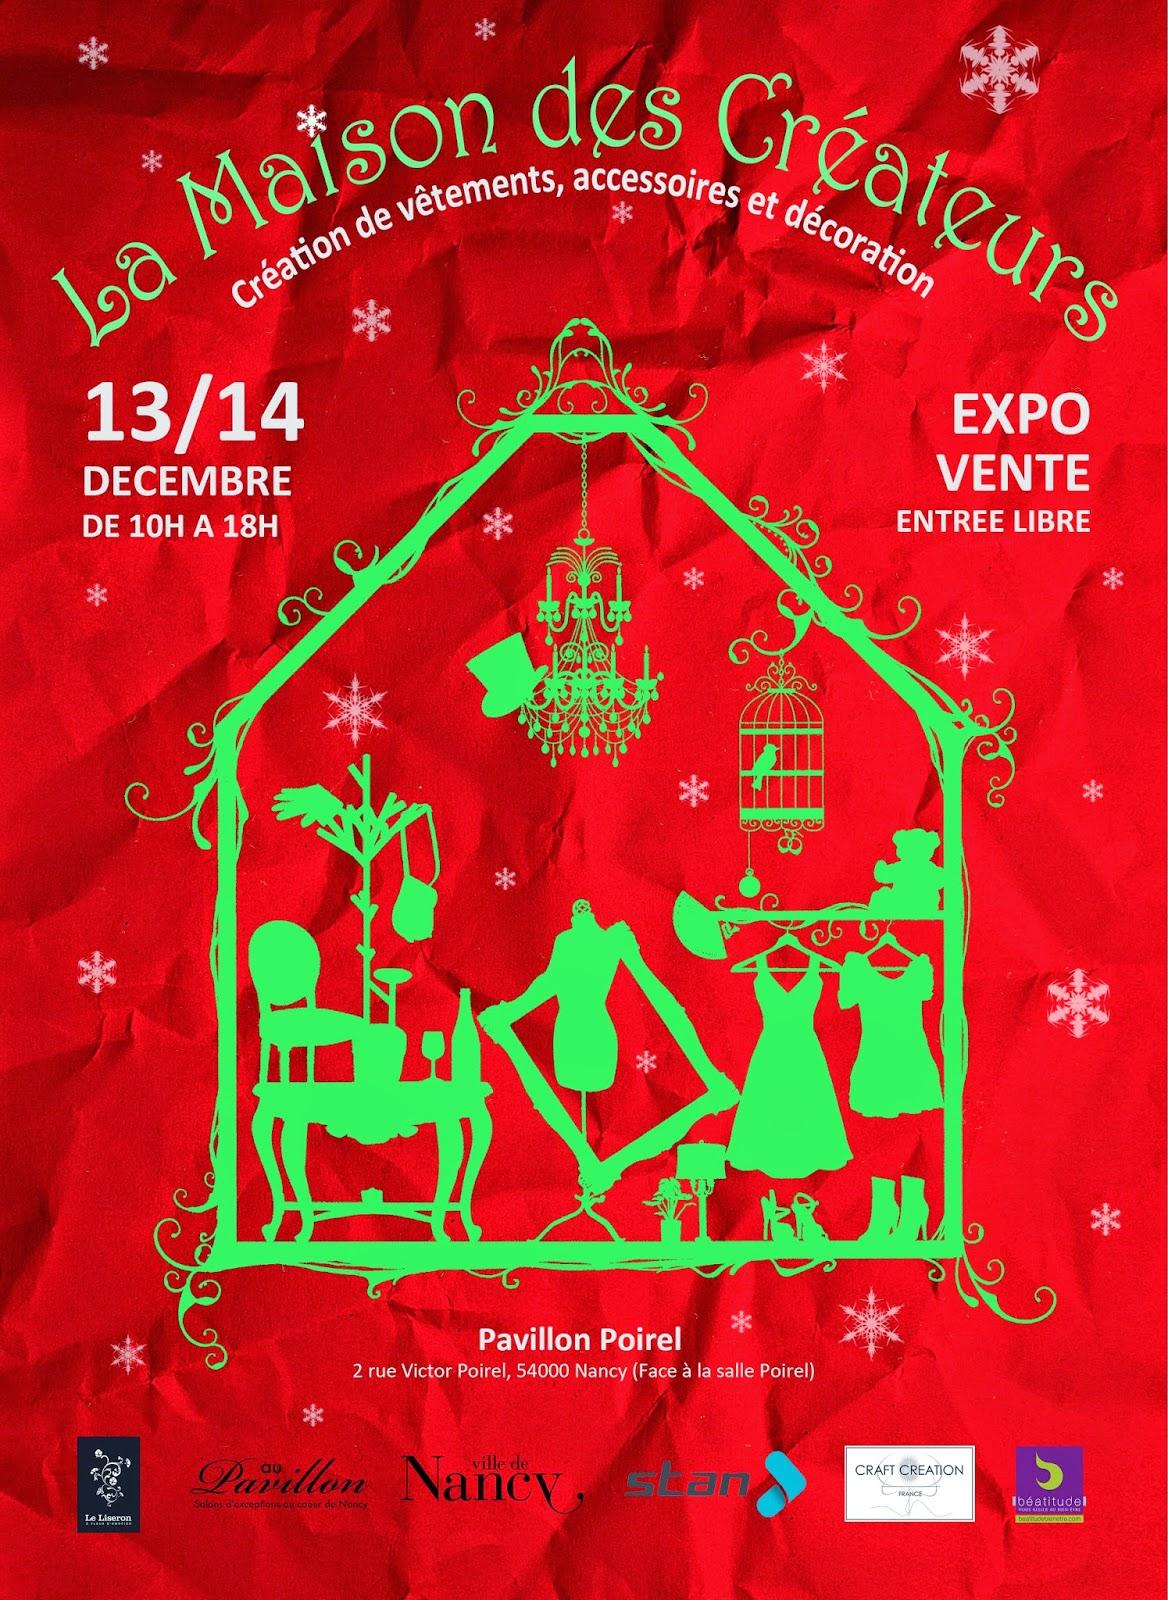 http://nancybuzz.fr/wp-content/uploads/2014/11/maison-creataurs-salle-poirel.jpg